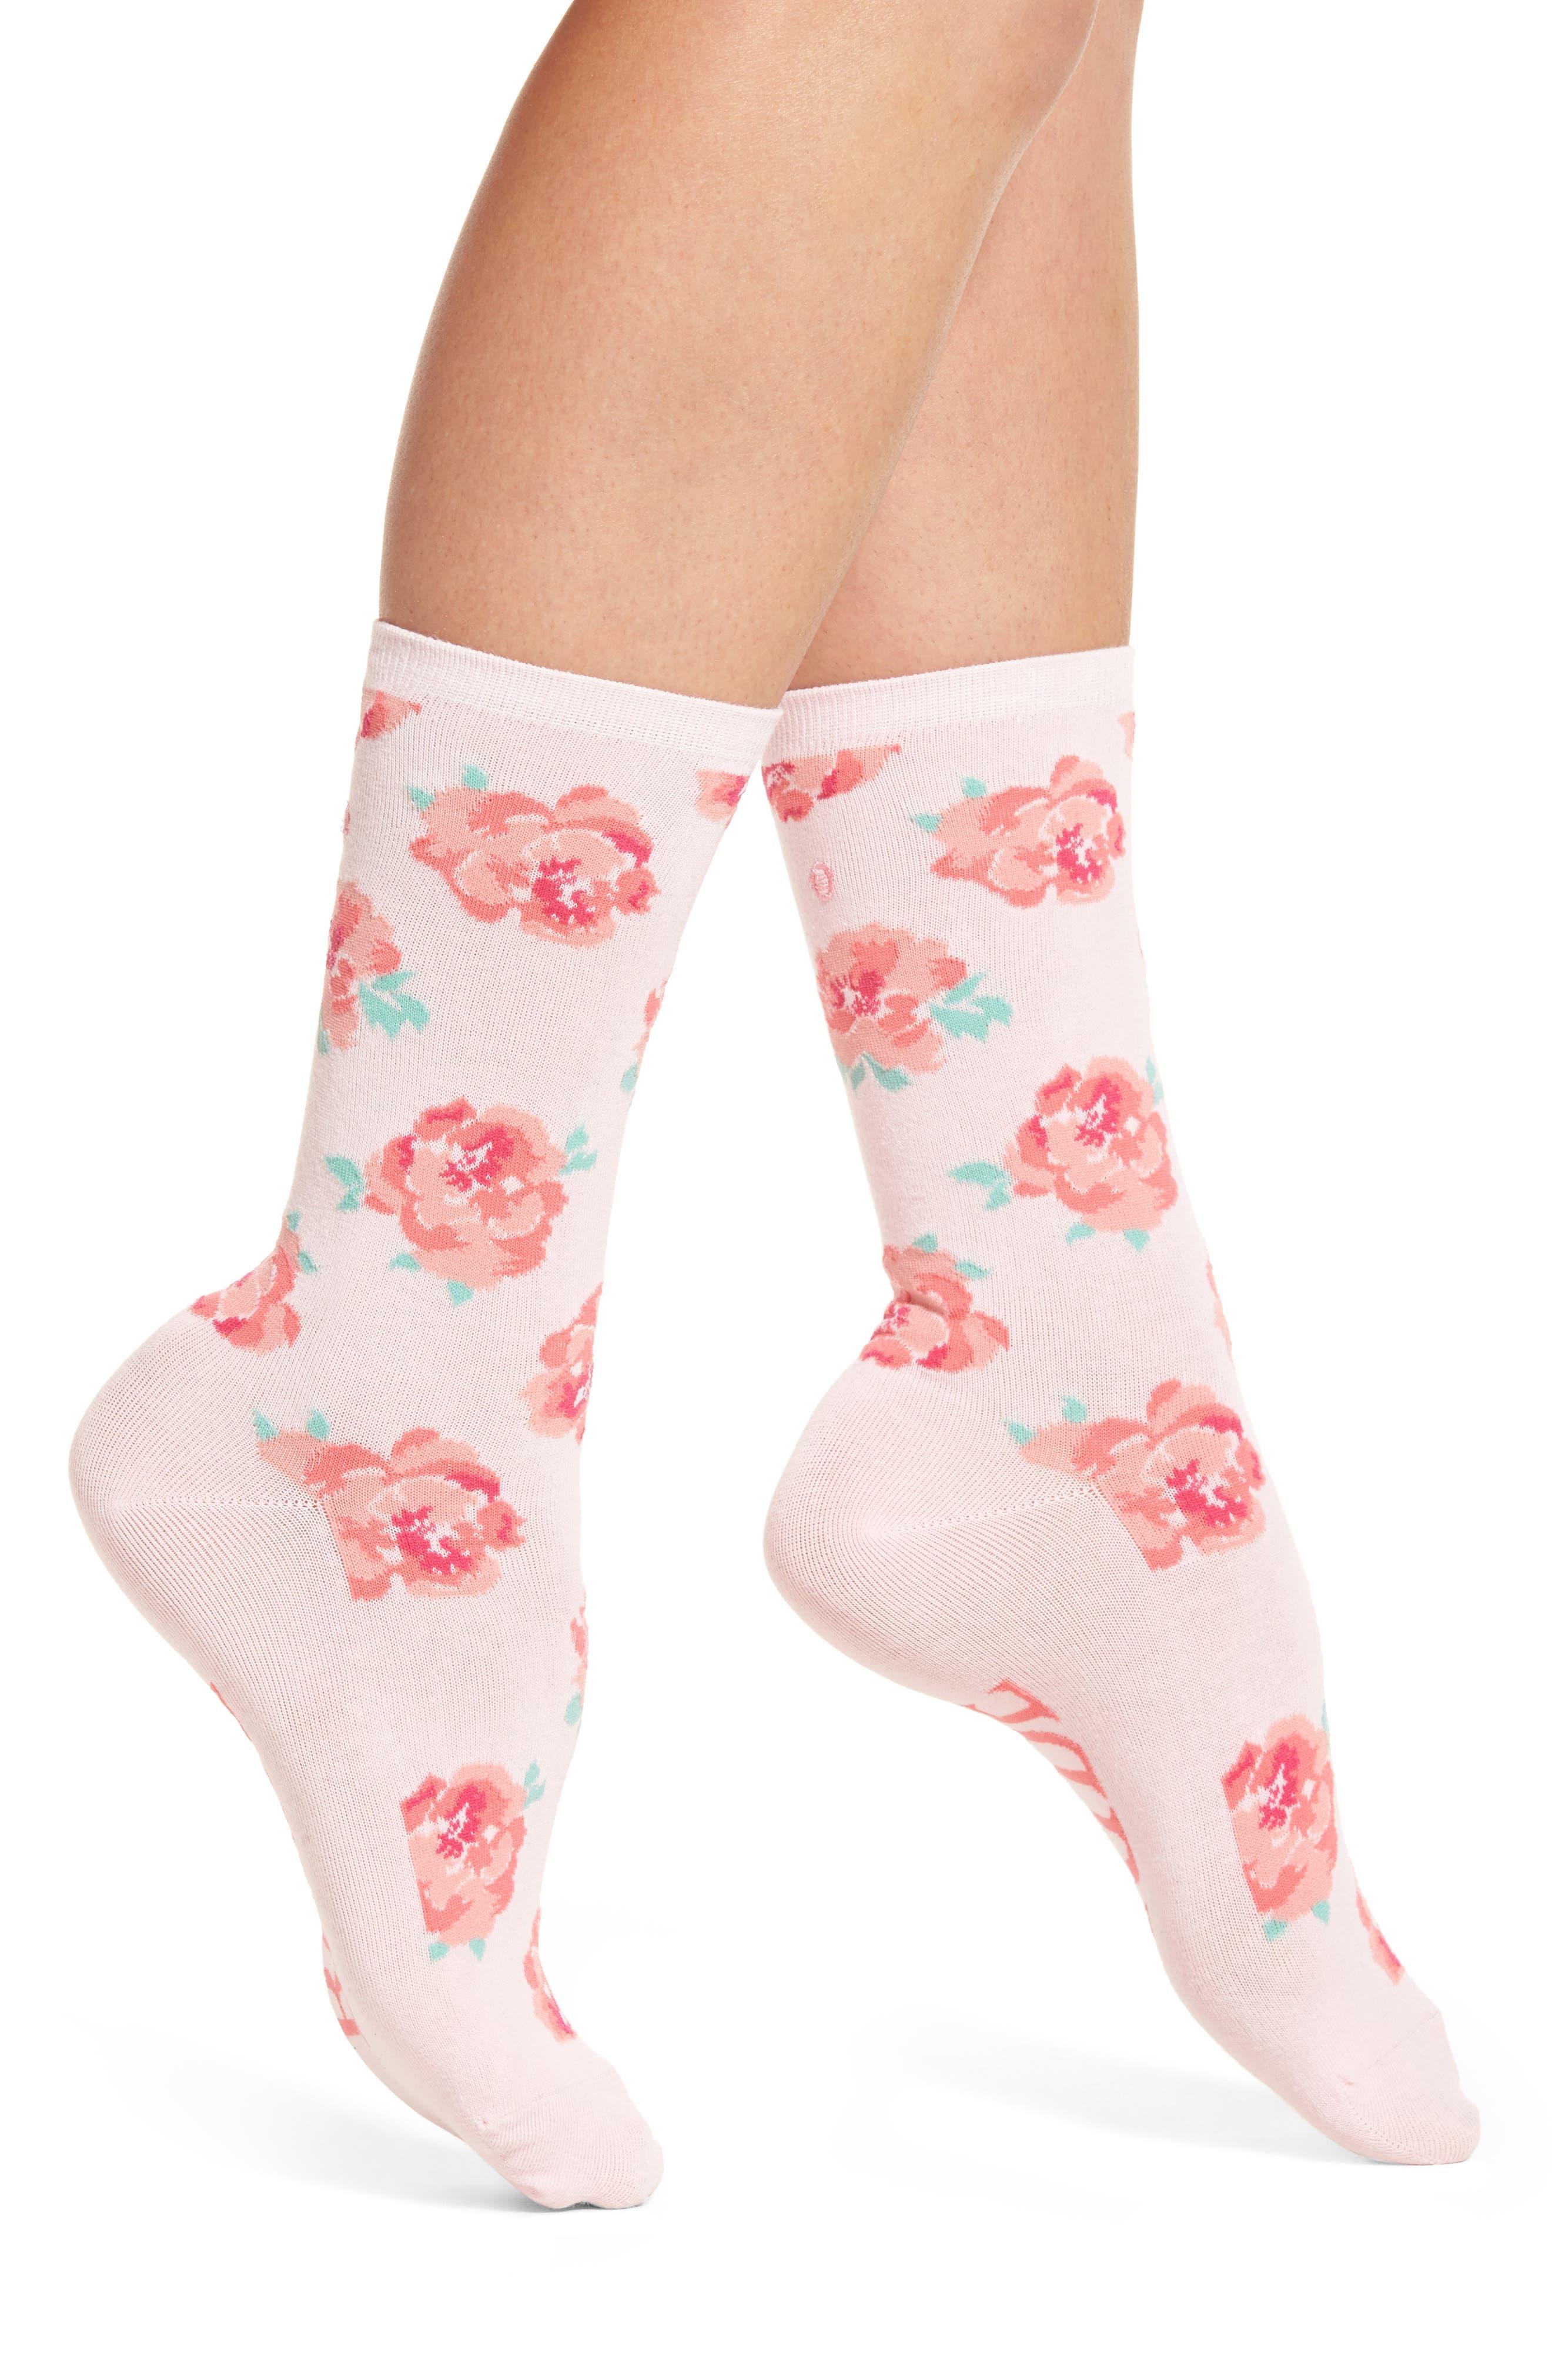 Bride Crew Socks,                             Alternate thumbnail 2, color,                             Light Pink